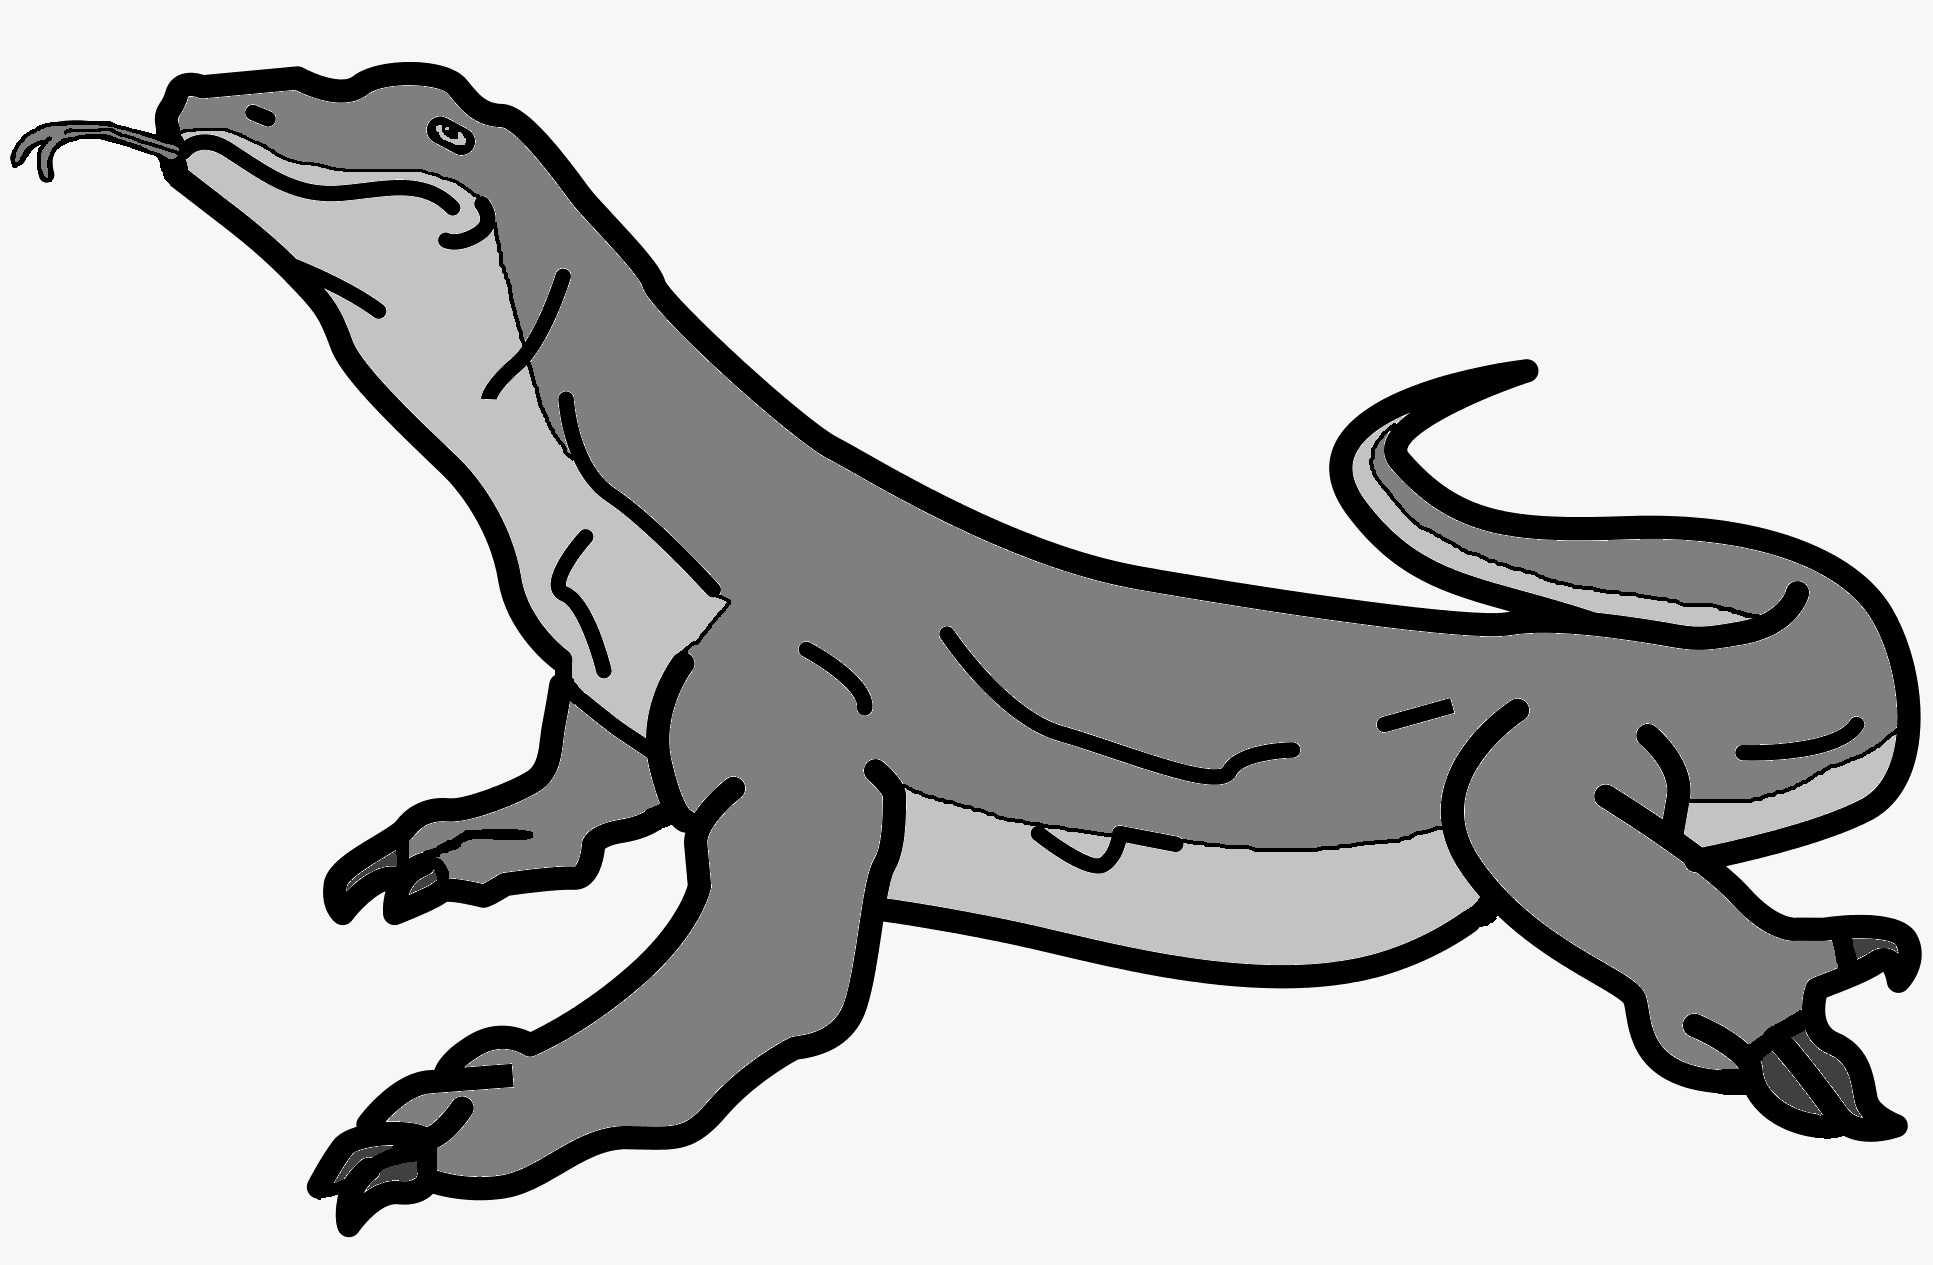 Komodo Dragon Wikipedia: Image - Stoned Komodo Dragon.jpg